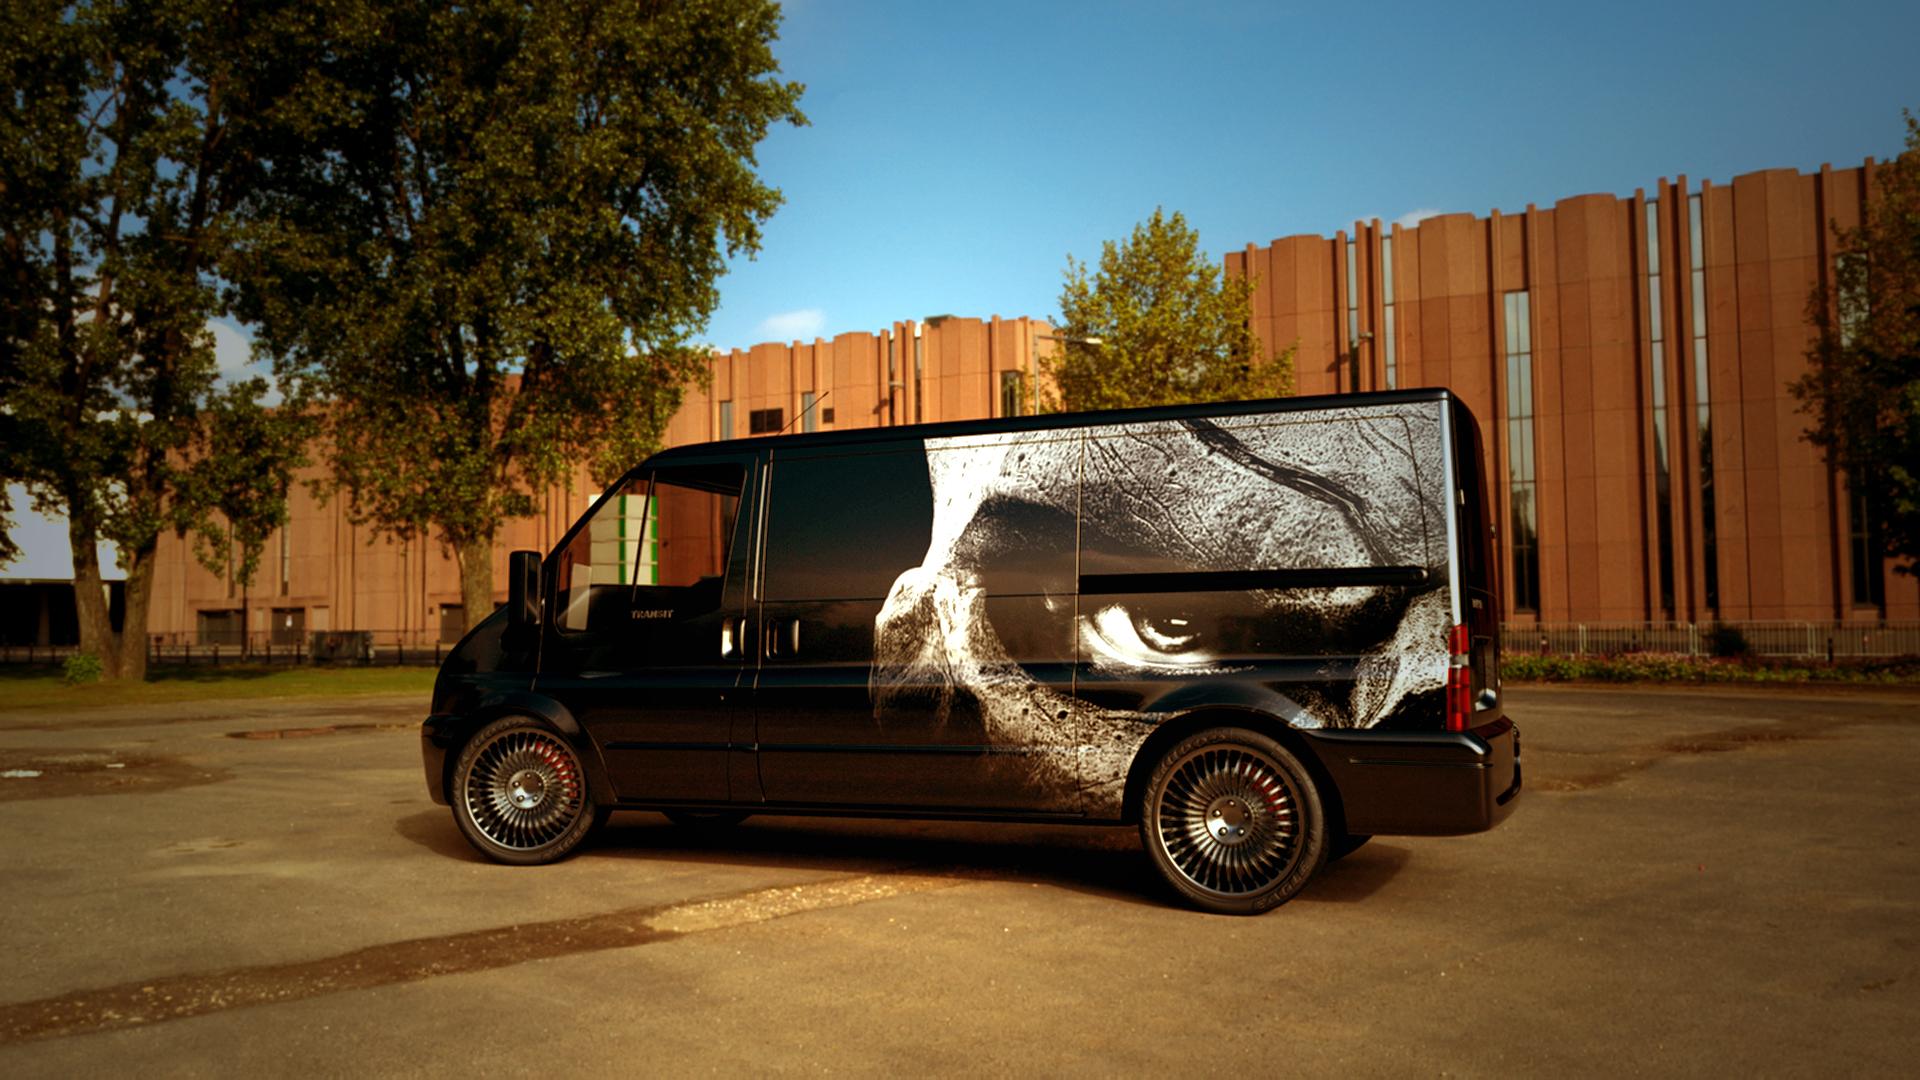 Ford Transit van 3d art